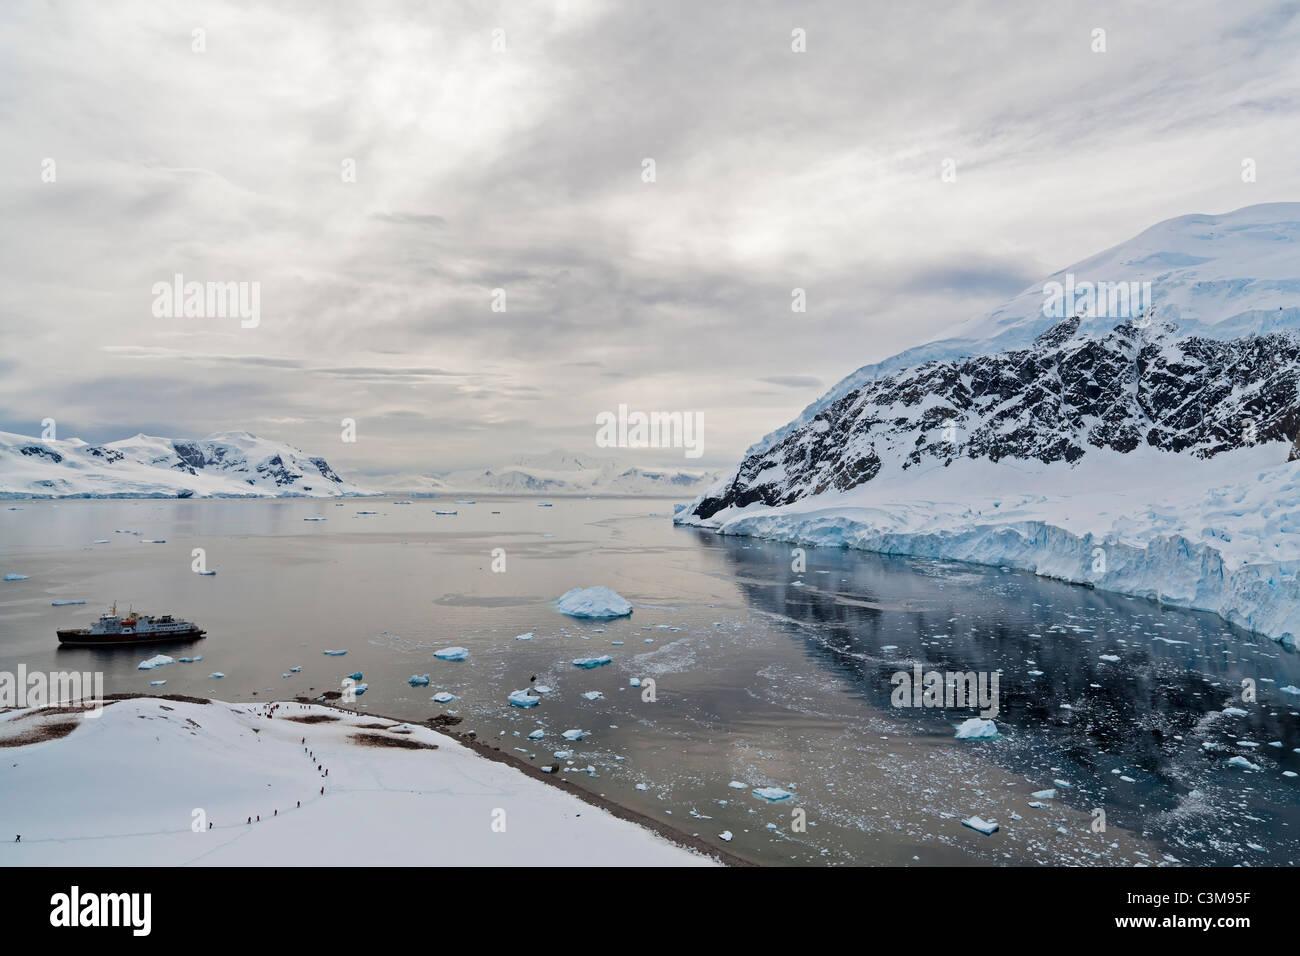 South Atlantic Ocean Antarctica, Antarctic Peninsula, Gerlache Strait, Neko Harbour, Tourist & polar star icebreaker - Stock Image